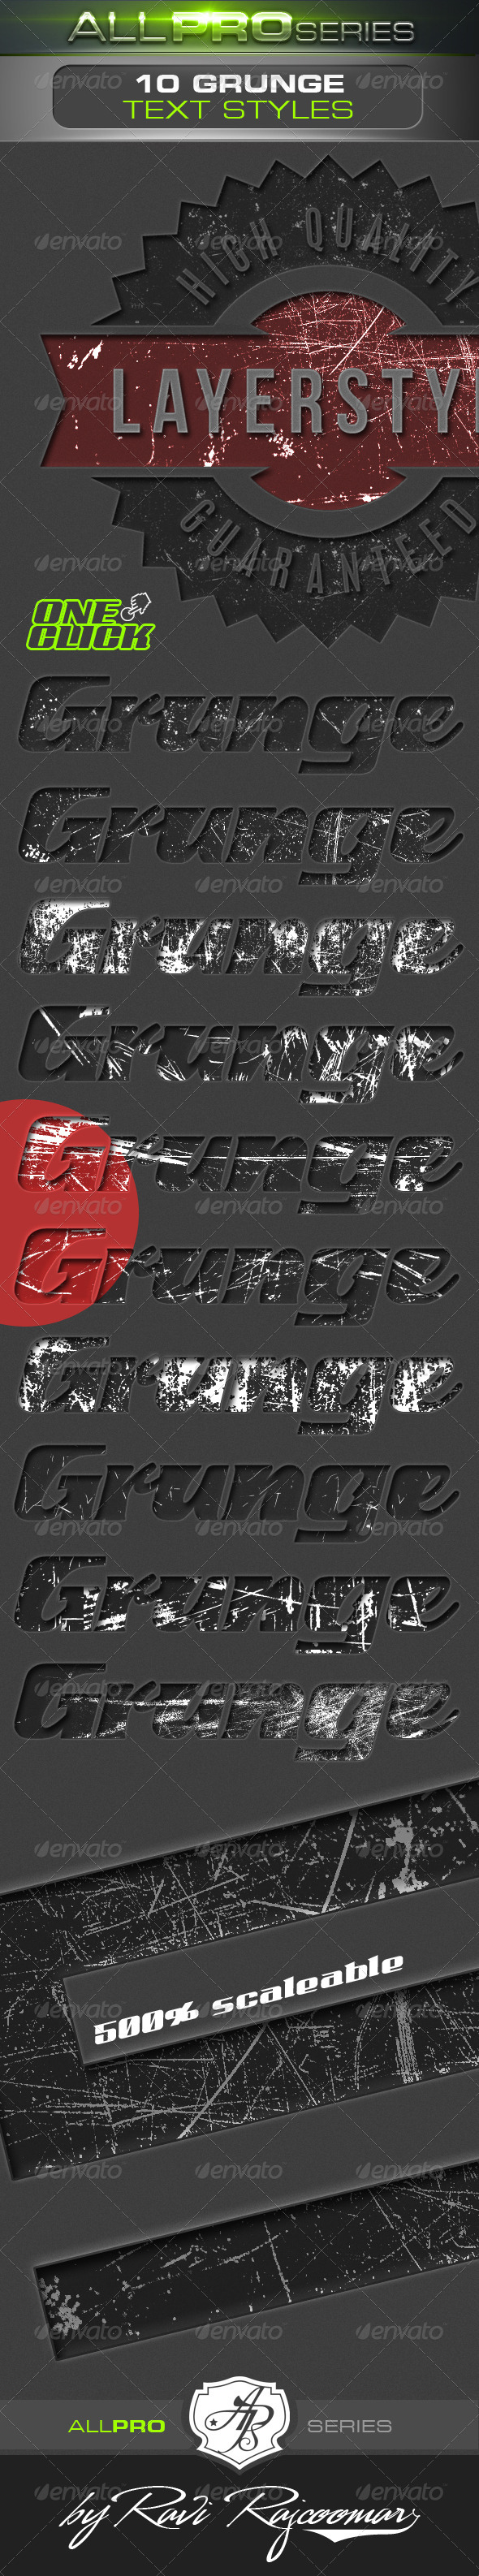 GraphicRiver Grunge Photoshop Text Styles 4705758